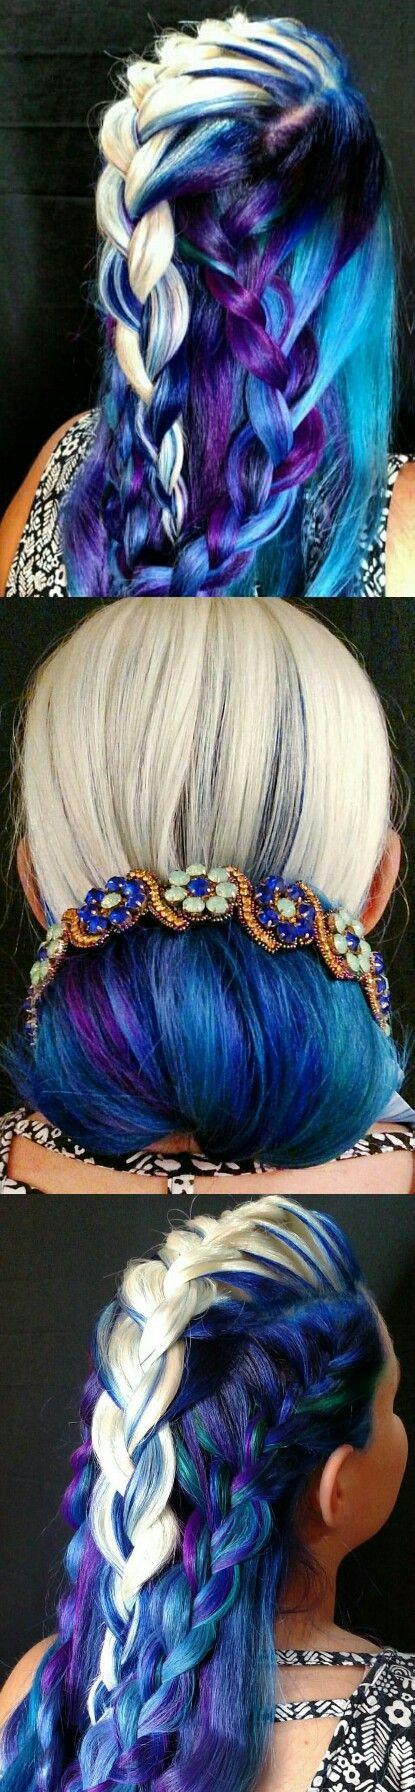 Blonde deep blue dyed hair @mvtoribriggs